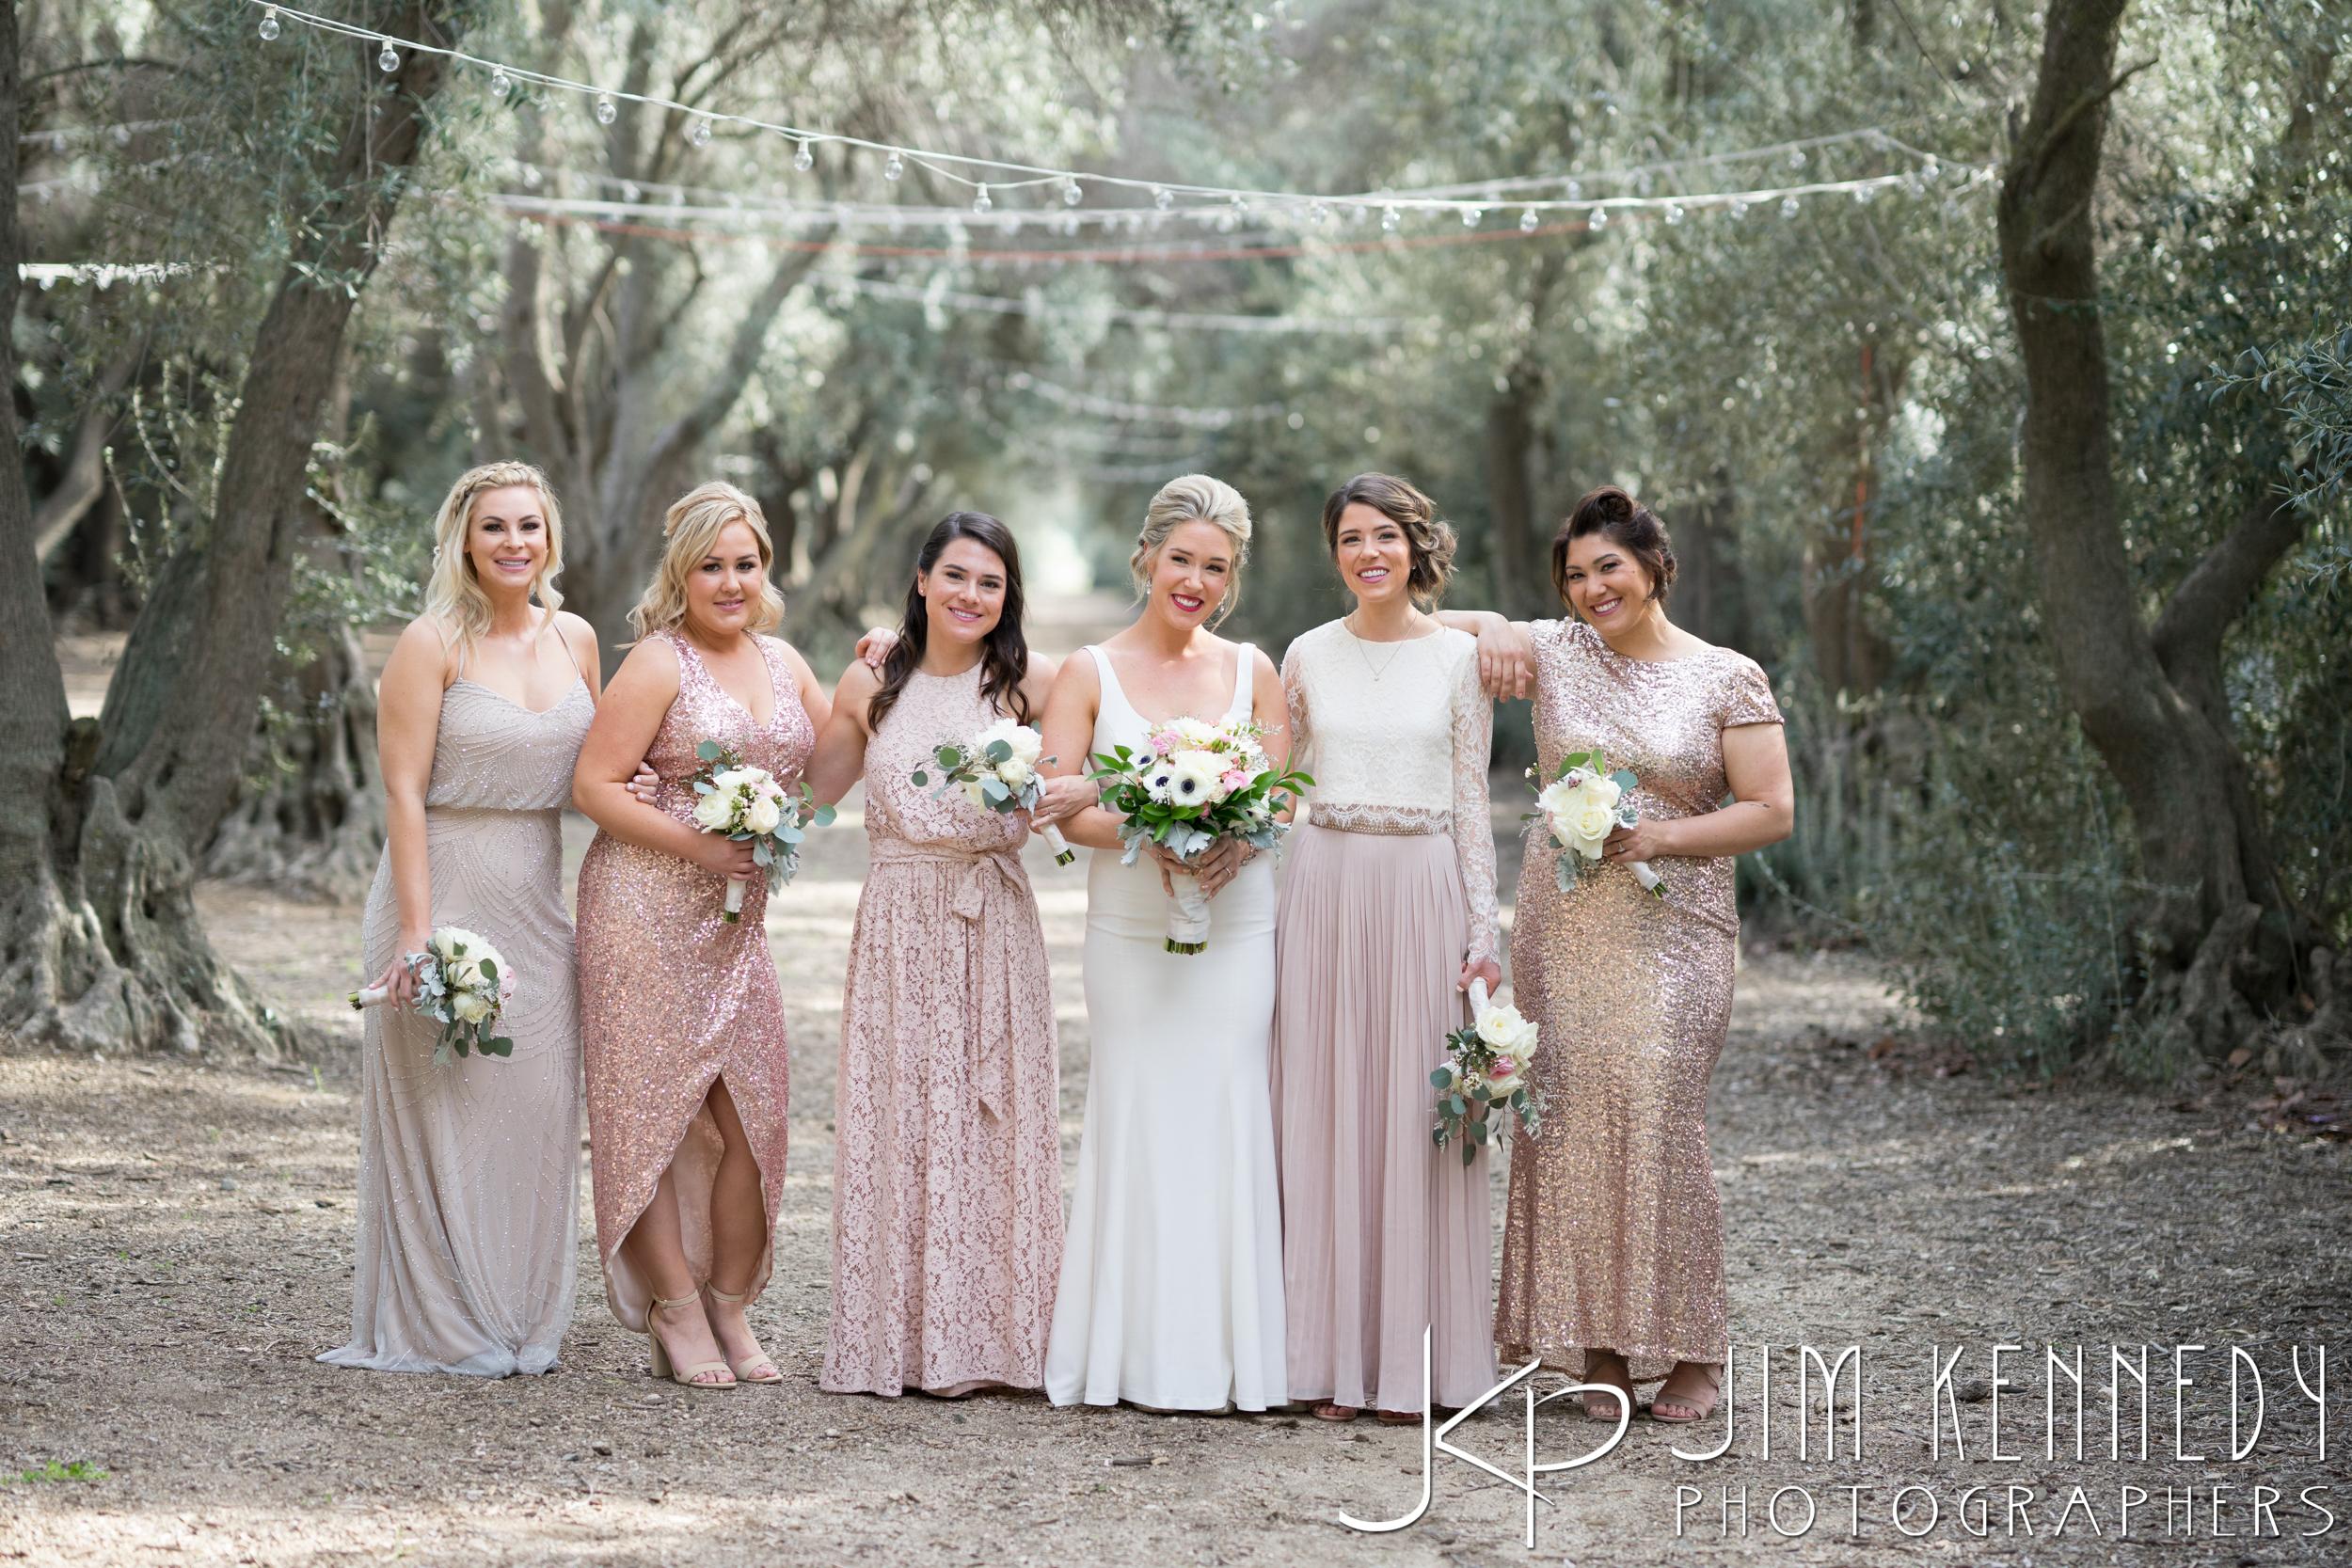 jim_kennedy_photographers_highland_springs_wedding_caitlyn_0062.jpg